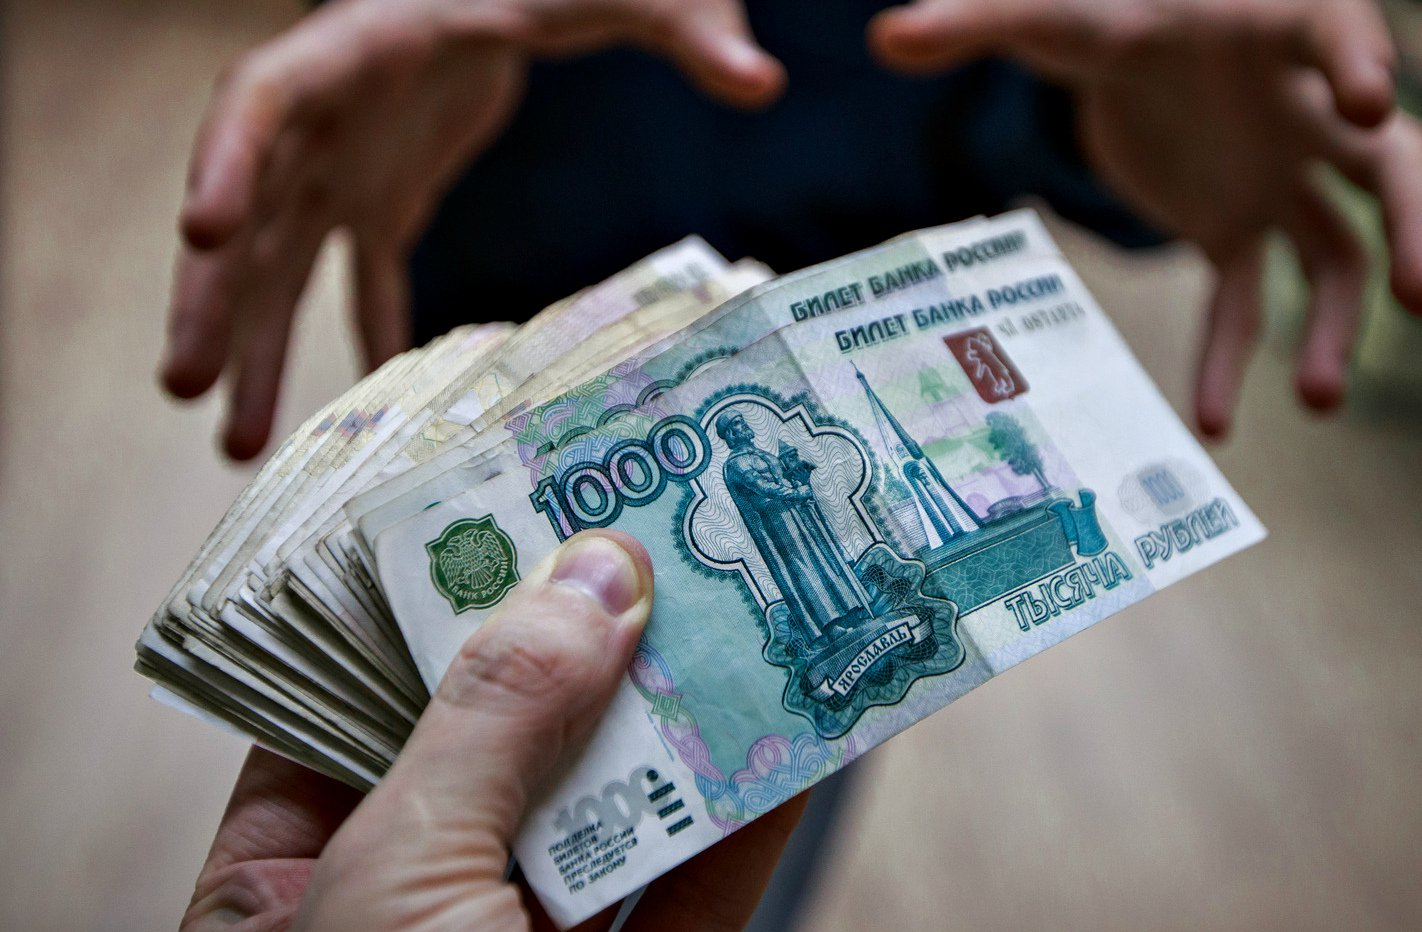 фото ЗакС политика Муниципала Косенко оштрафовали на 18 млн рублей за взятку